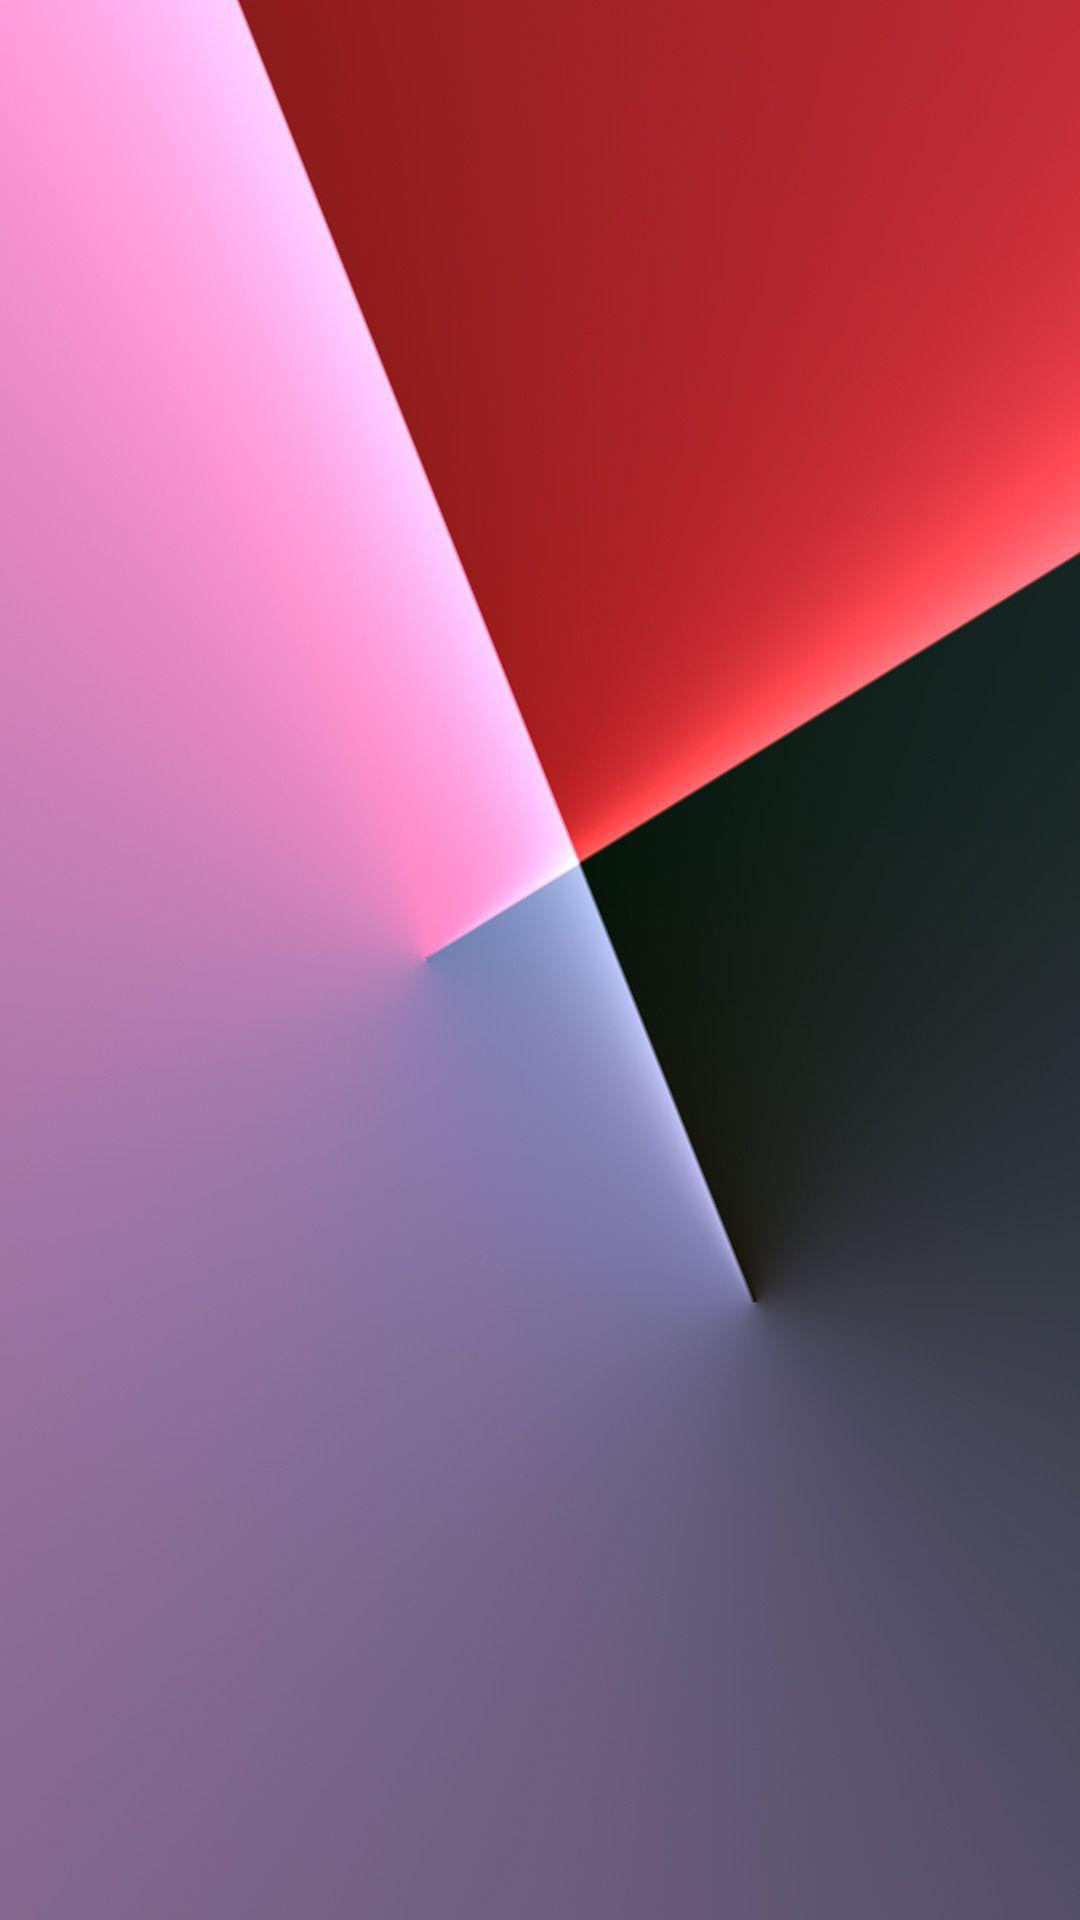 Download Vodafone Smart V8 Stock Wallpapers Droidviews Graphic Wallpaper Abstract Iphone Wallpaper Galaxy Wallpaper